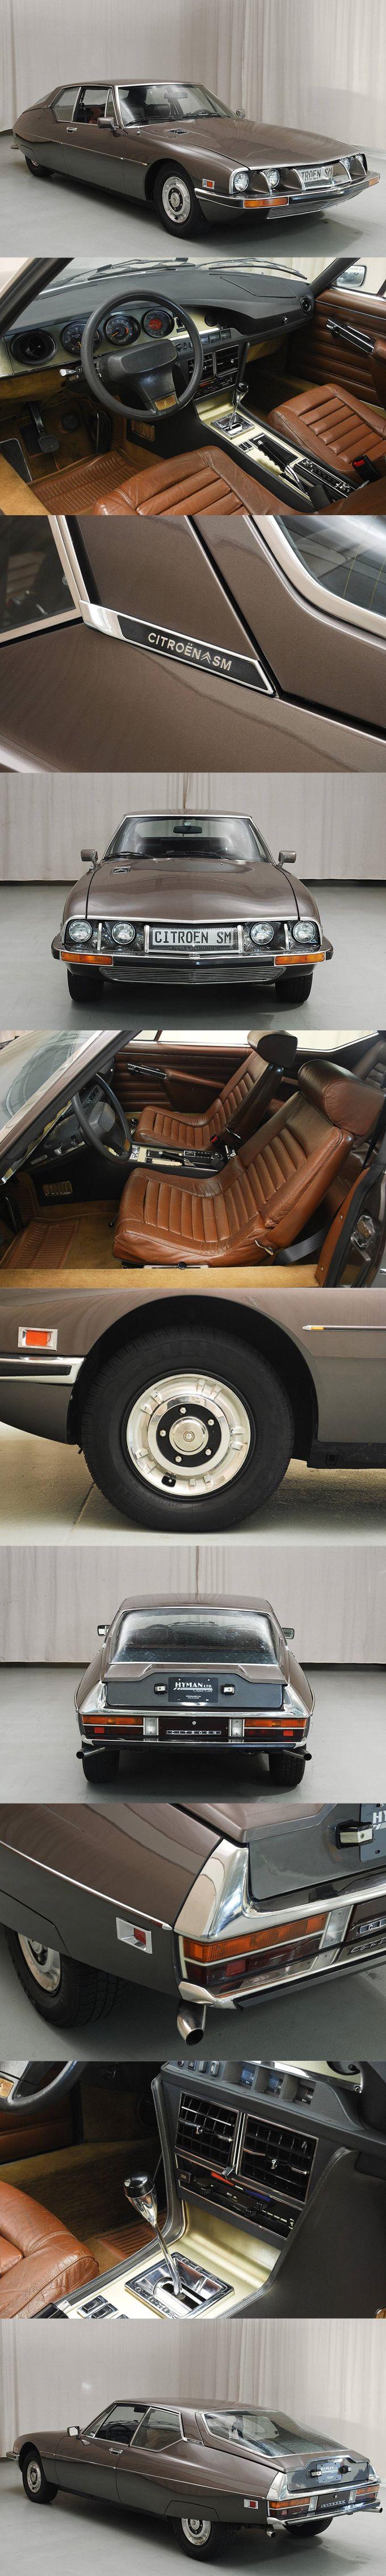 1973 Citroën SM / USA spec / brown smoke grey / France / Maserati V6 / Robert Opron / Hymanltd.com / 17-331